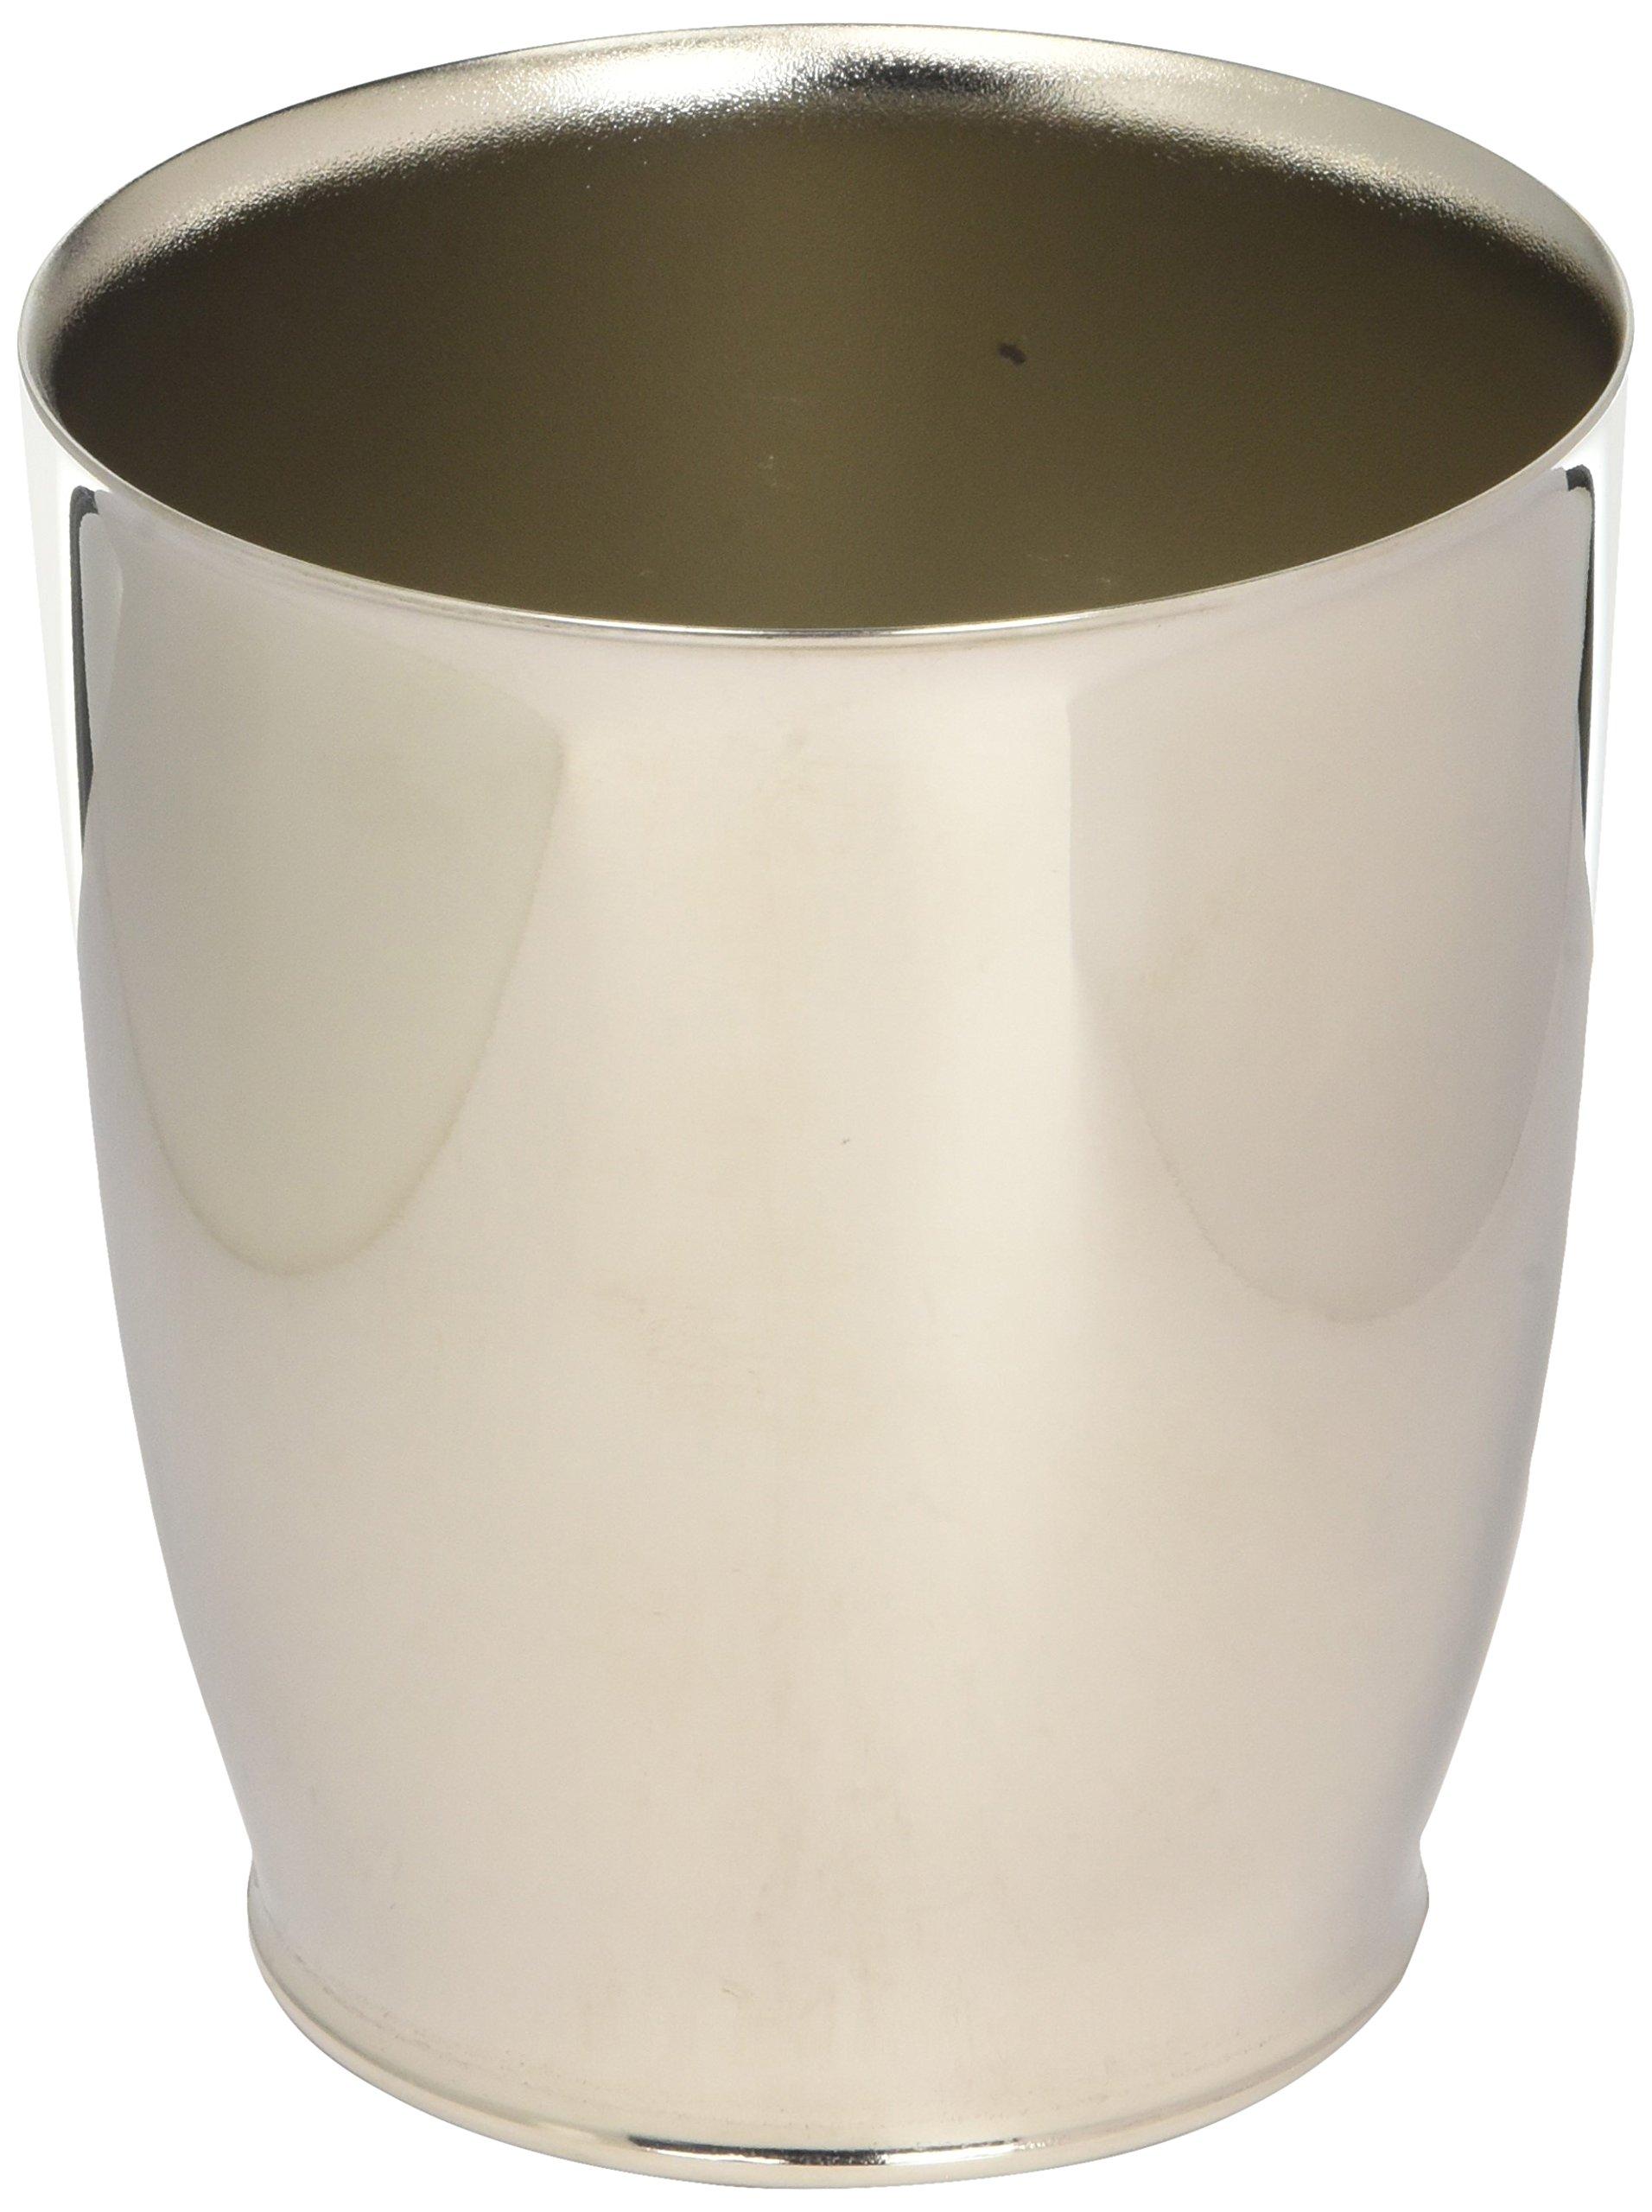 Mepra Coffee Spoon Stand